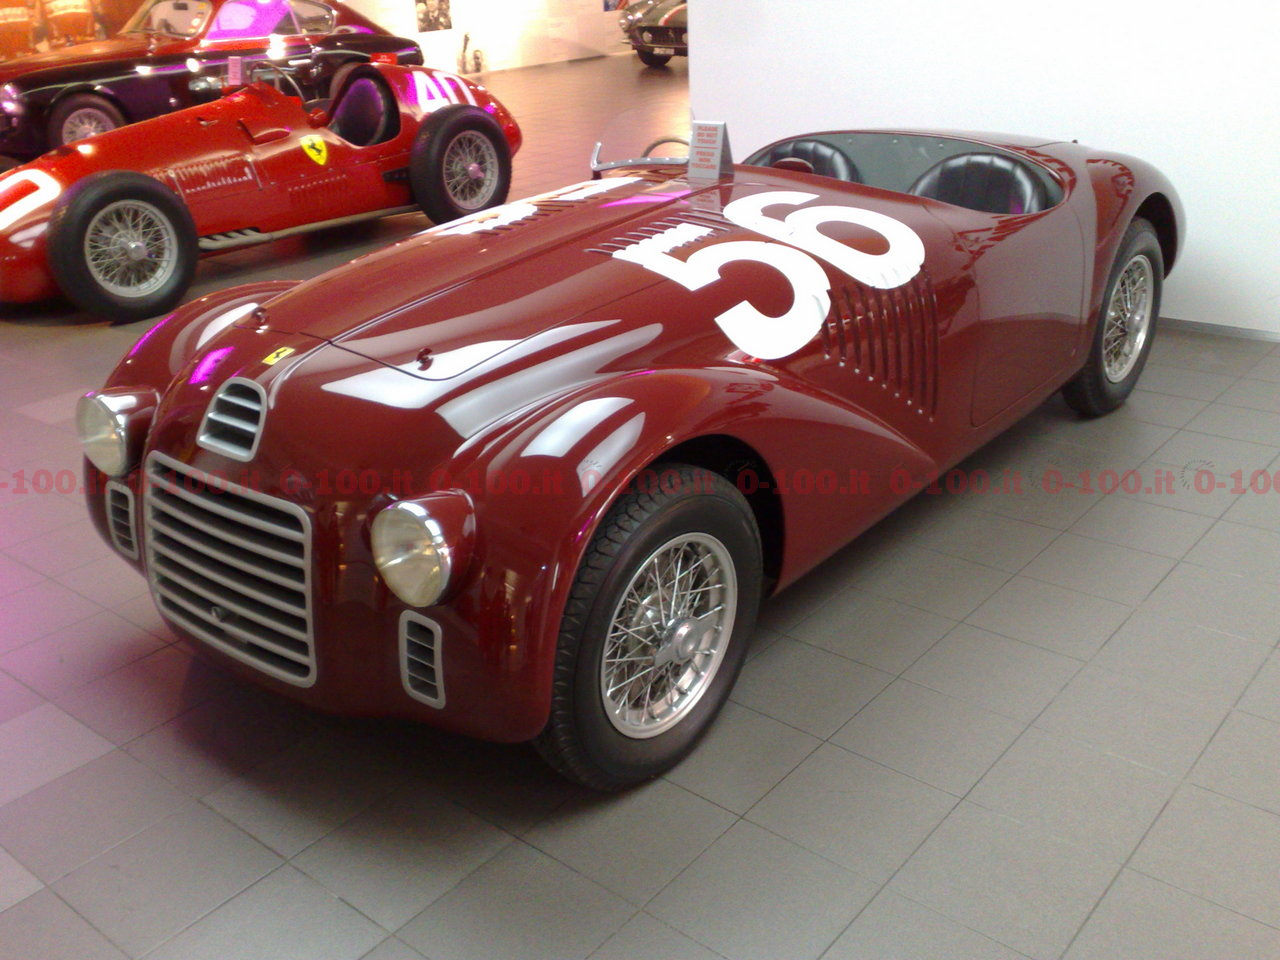 ferrari-125_sport-12cilindri-01C-march_12-1947-enzo-ferrari_0-100_11